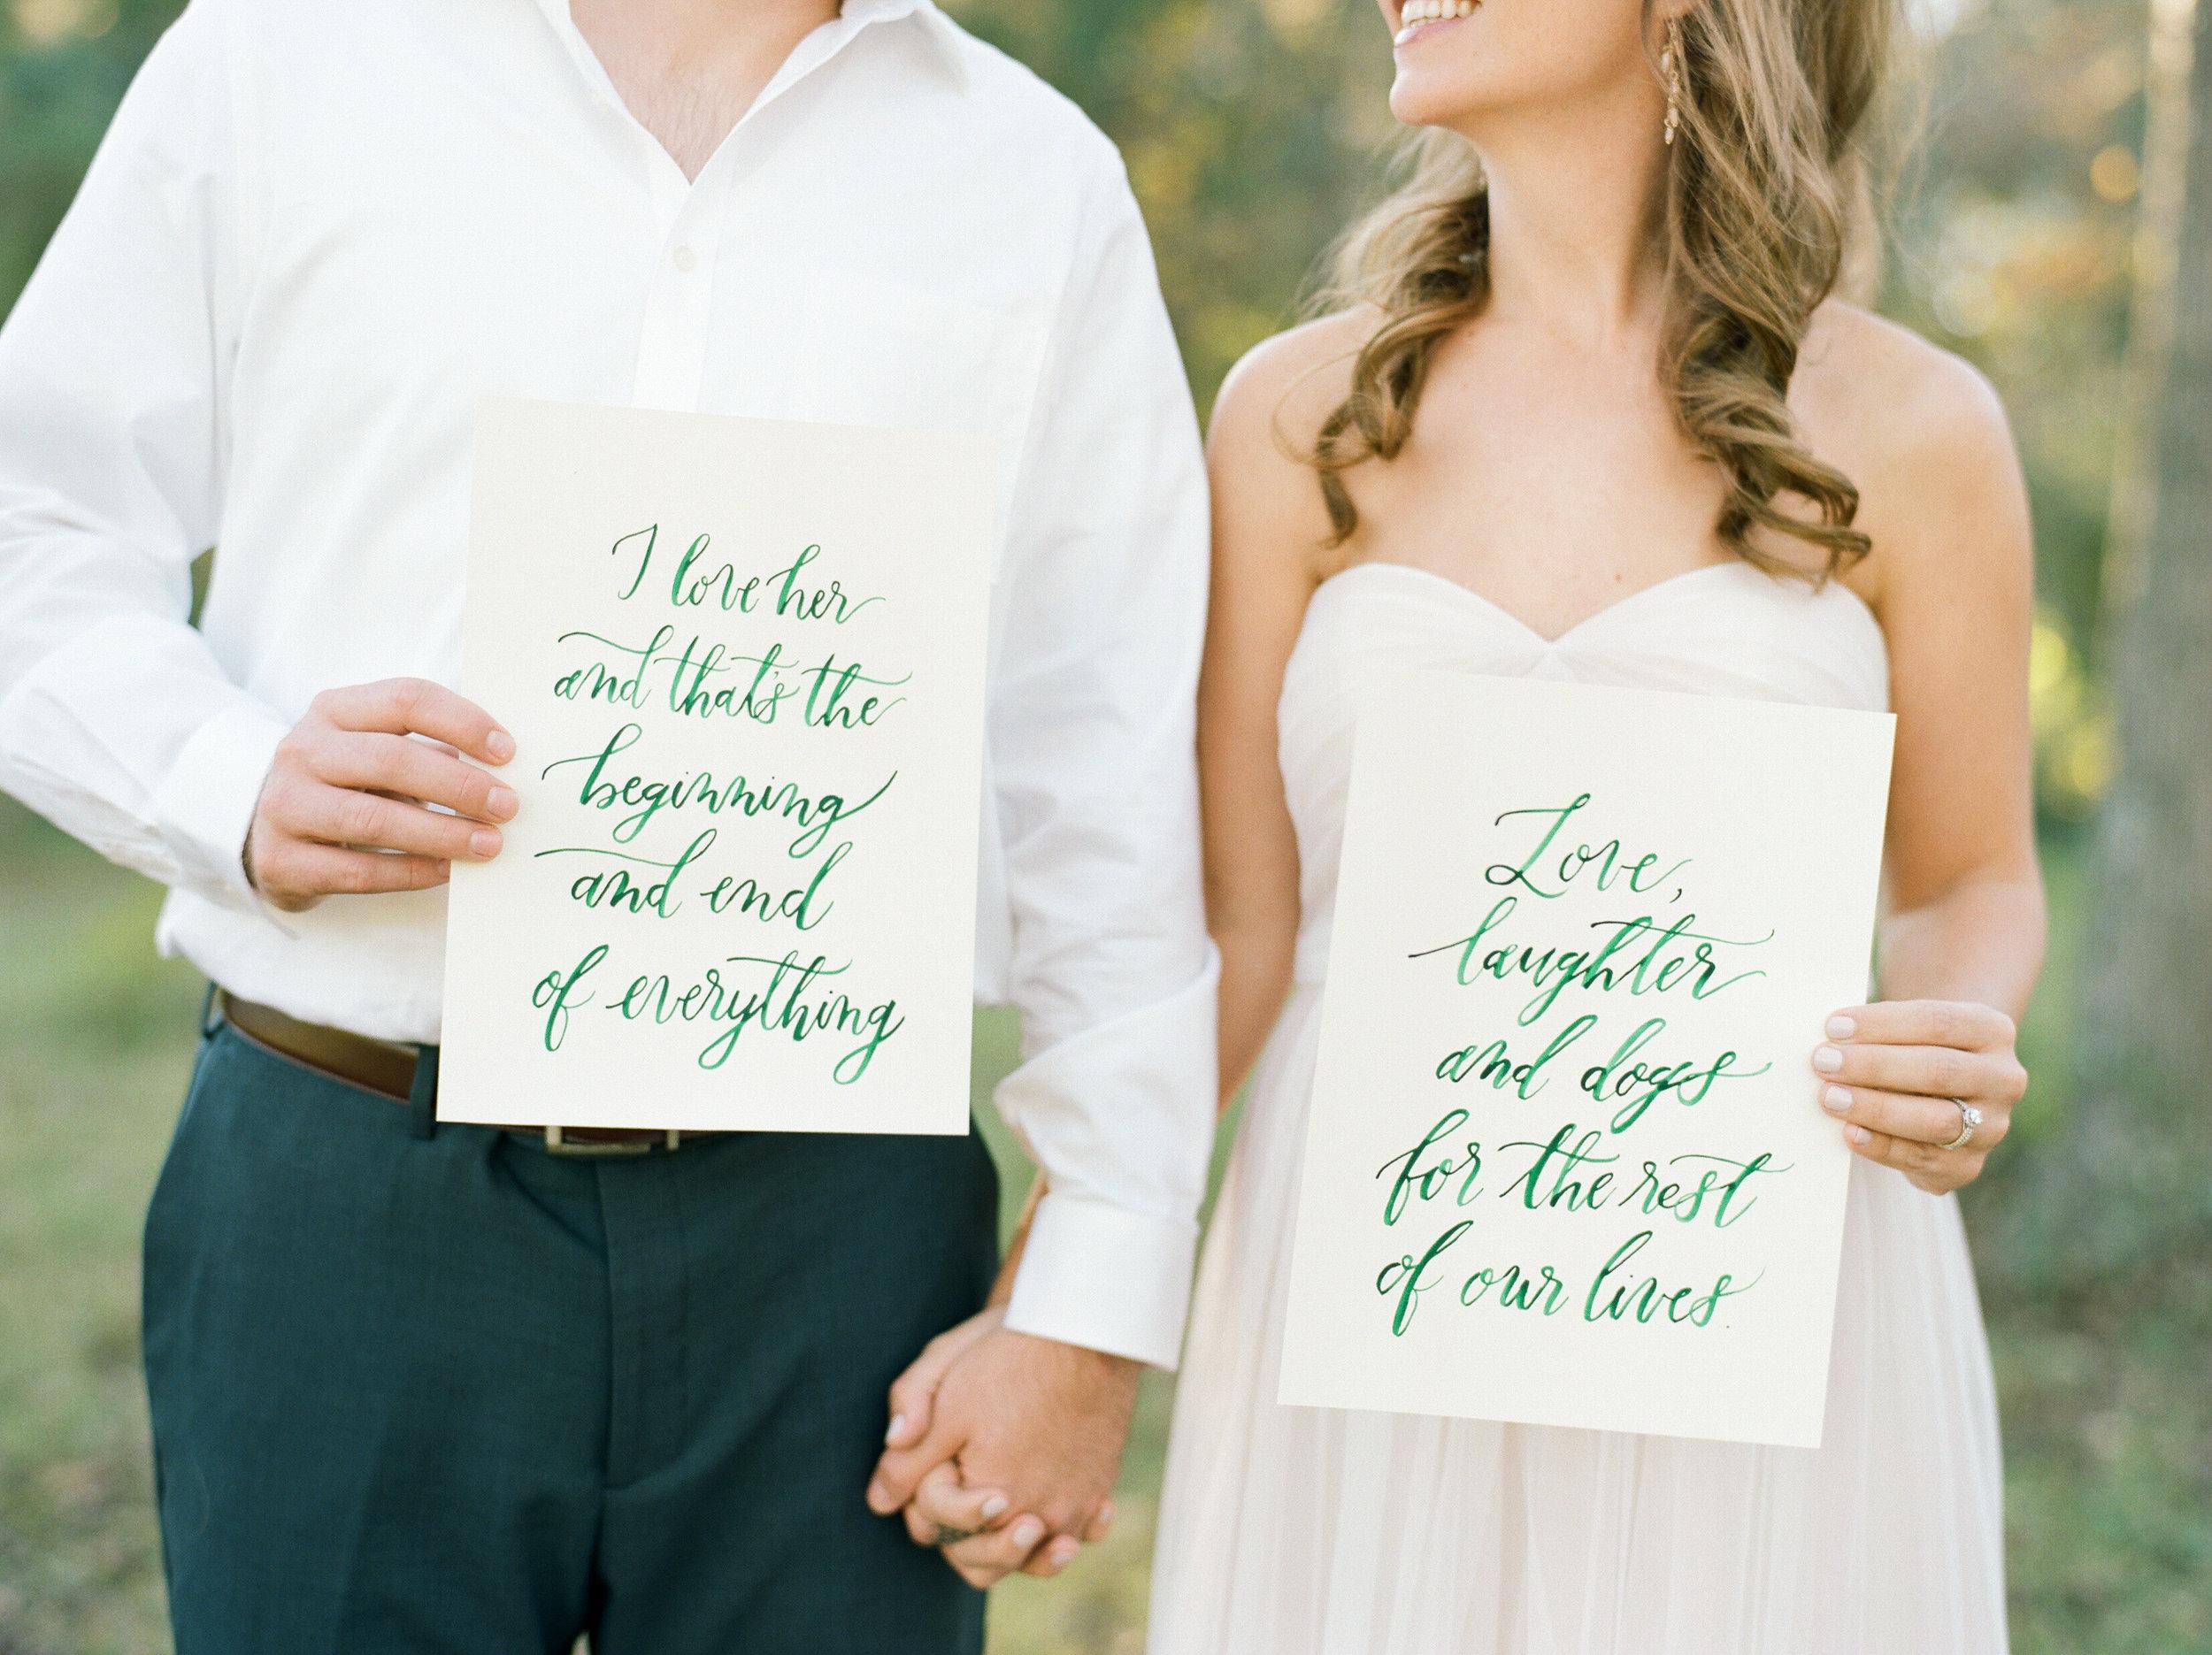 dana-fernandez-photography-houston-wedding-photographer-portraits-engagements-anniversary-session-film-photographer-austin-wedding-photographer-7.jpg